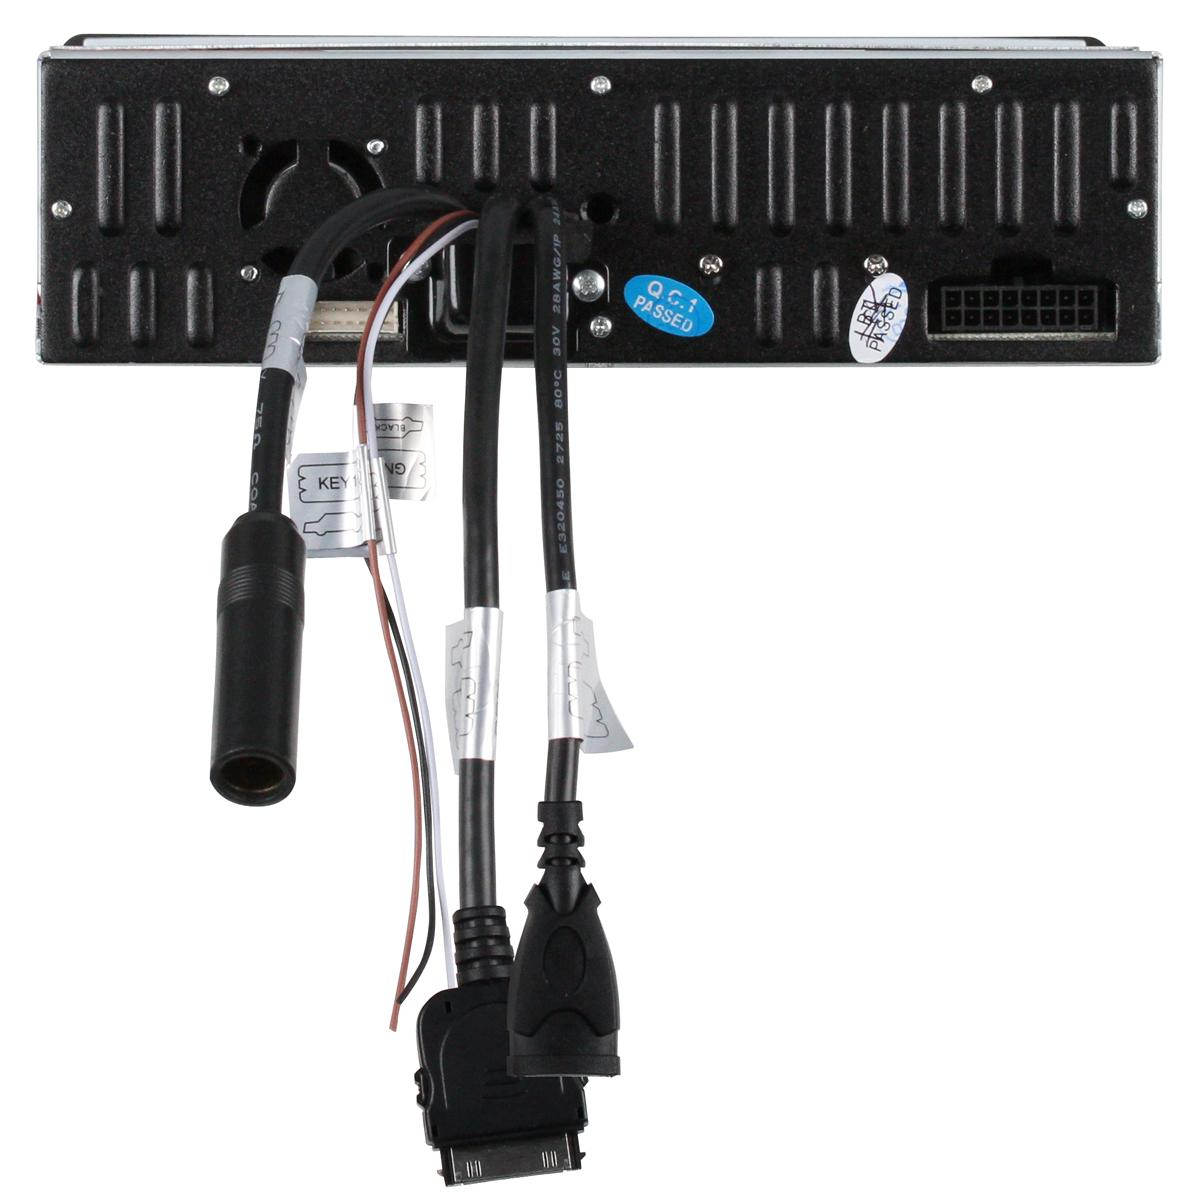 pyle audio wiring harness b amazon com boss    audio    bv9967bi in dash single din 7 inch  amazon com boss    audio    bv9967bi in dash single din 7 inch